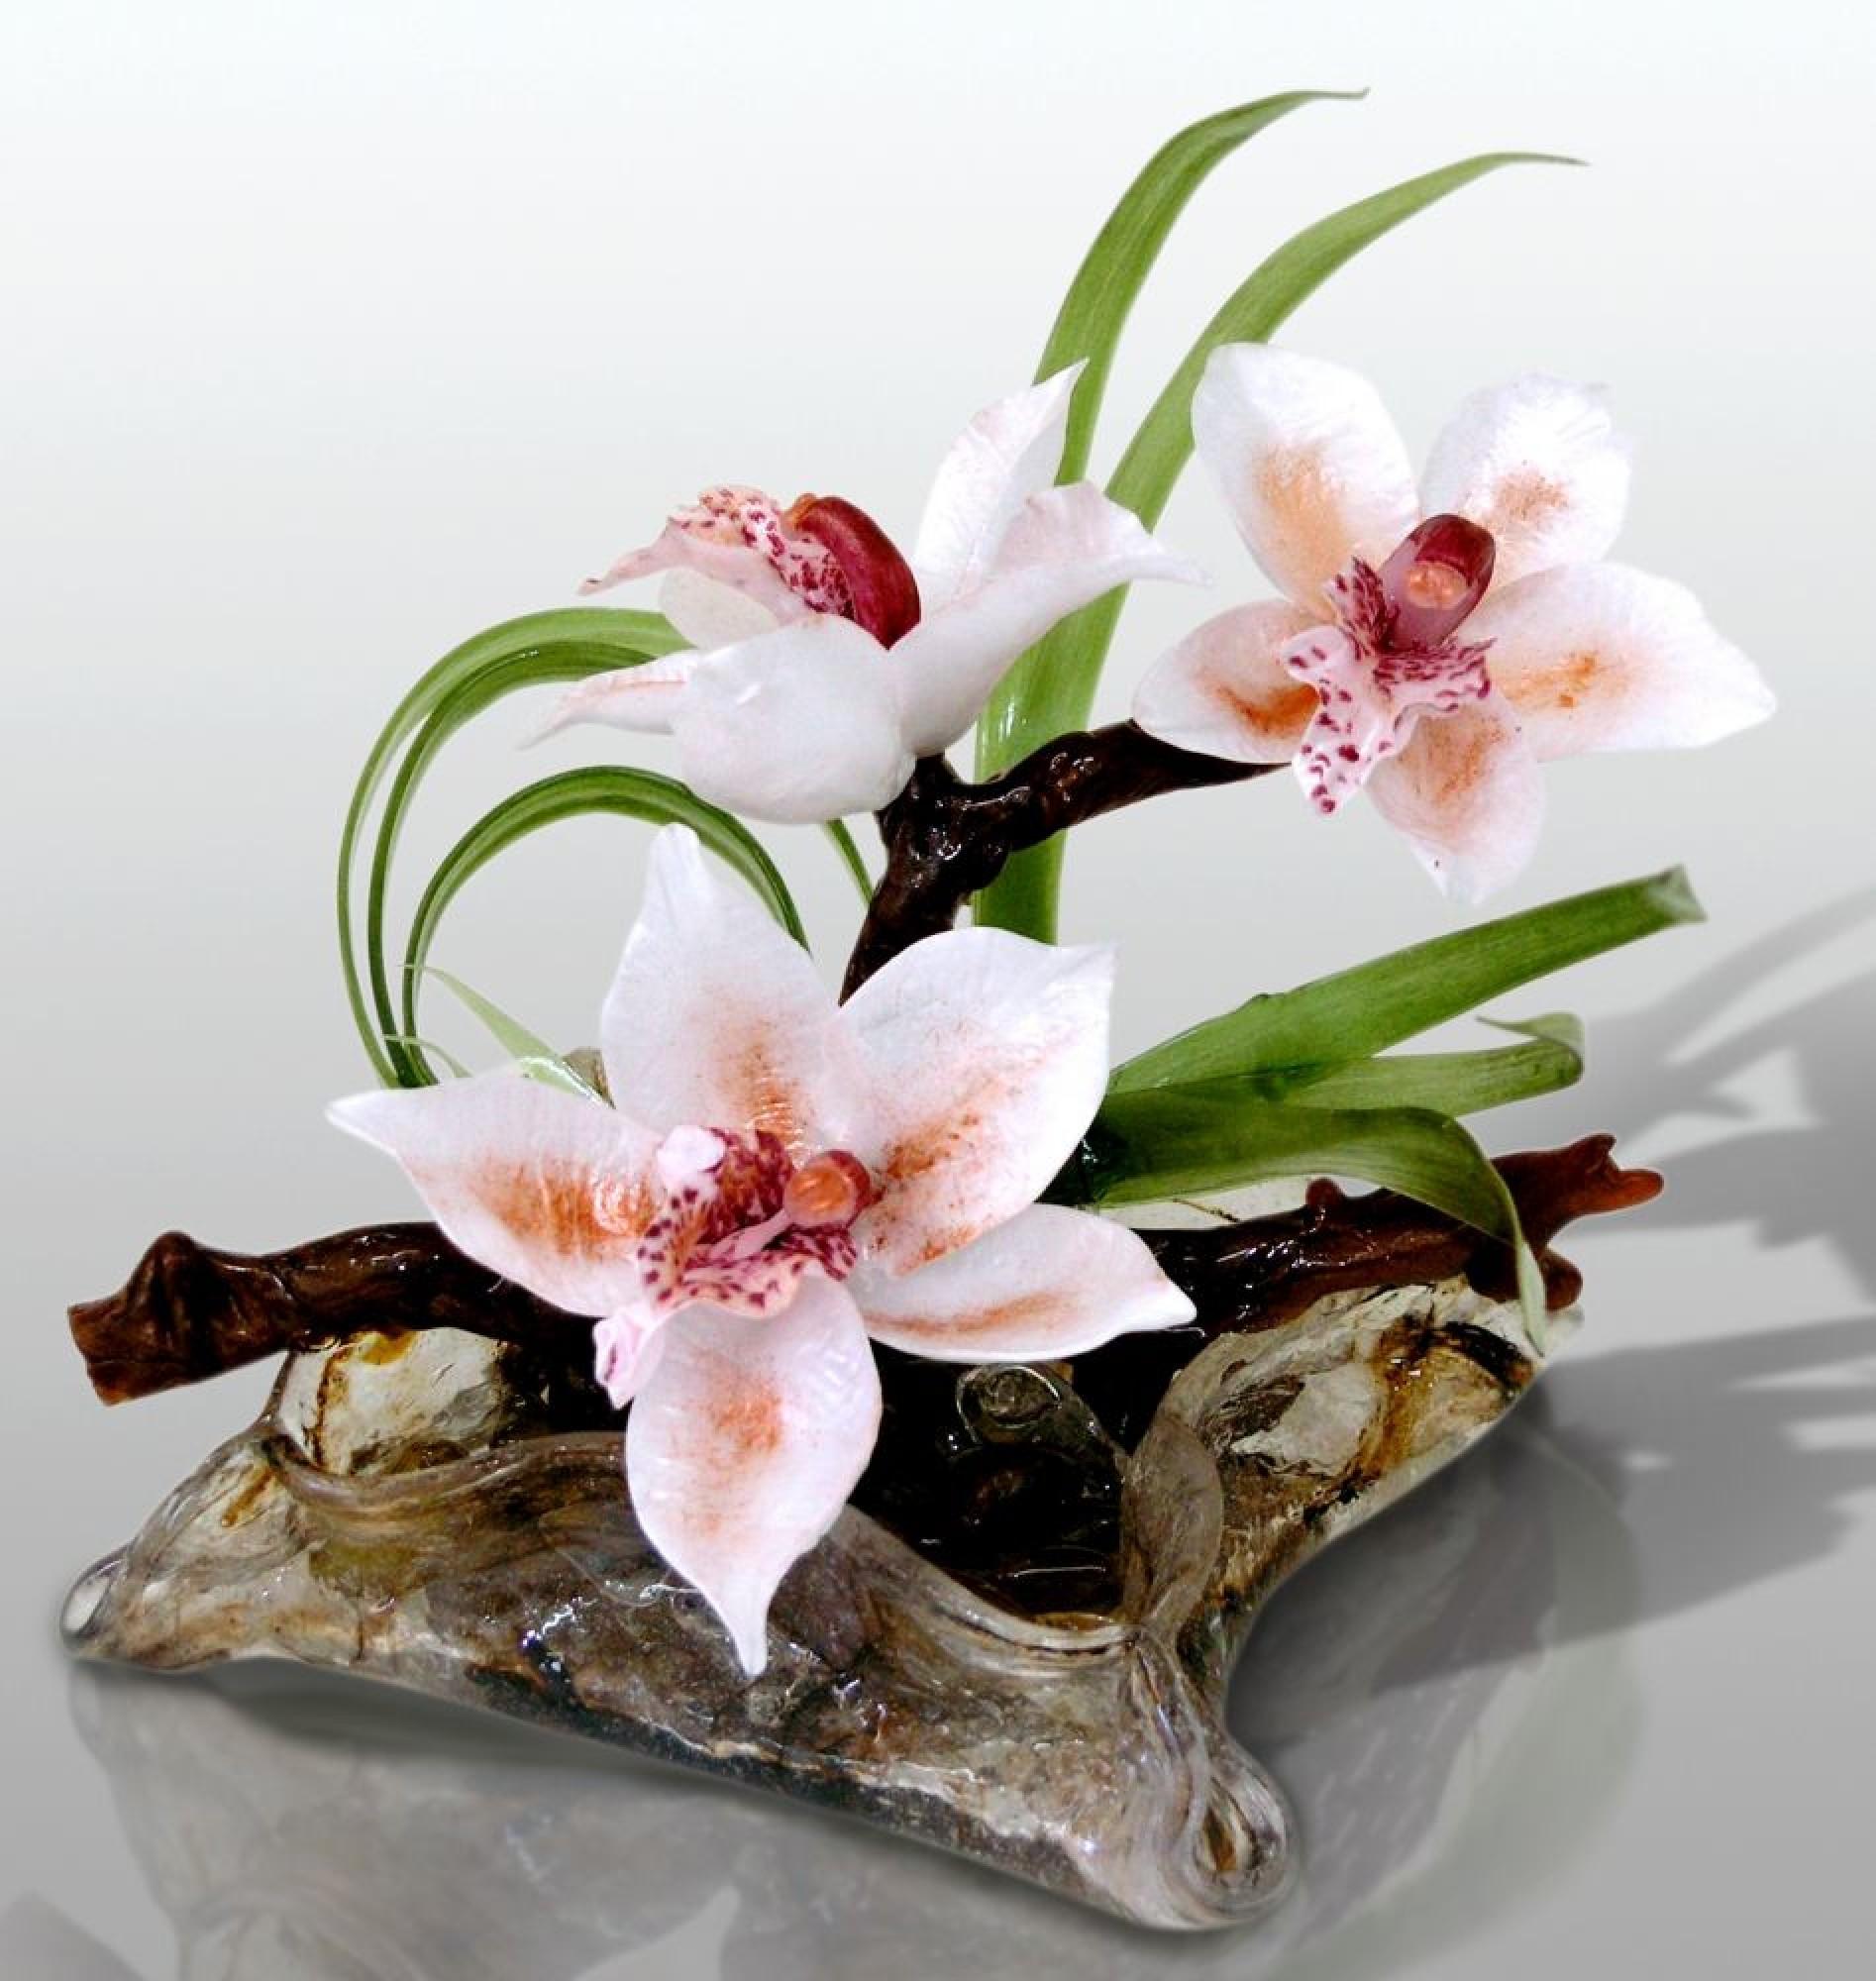 позднее фото цветы из карамели итоге решили